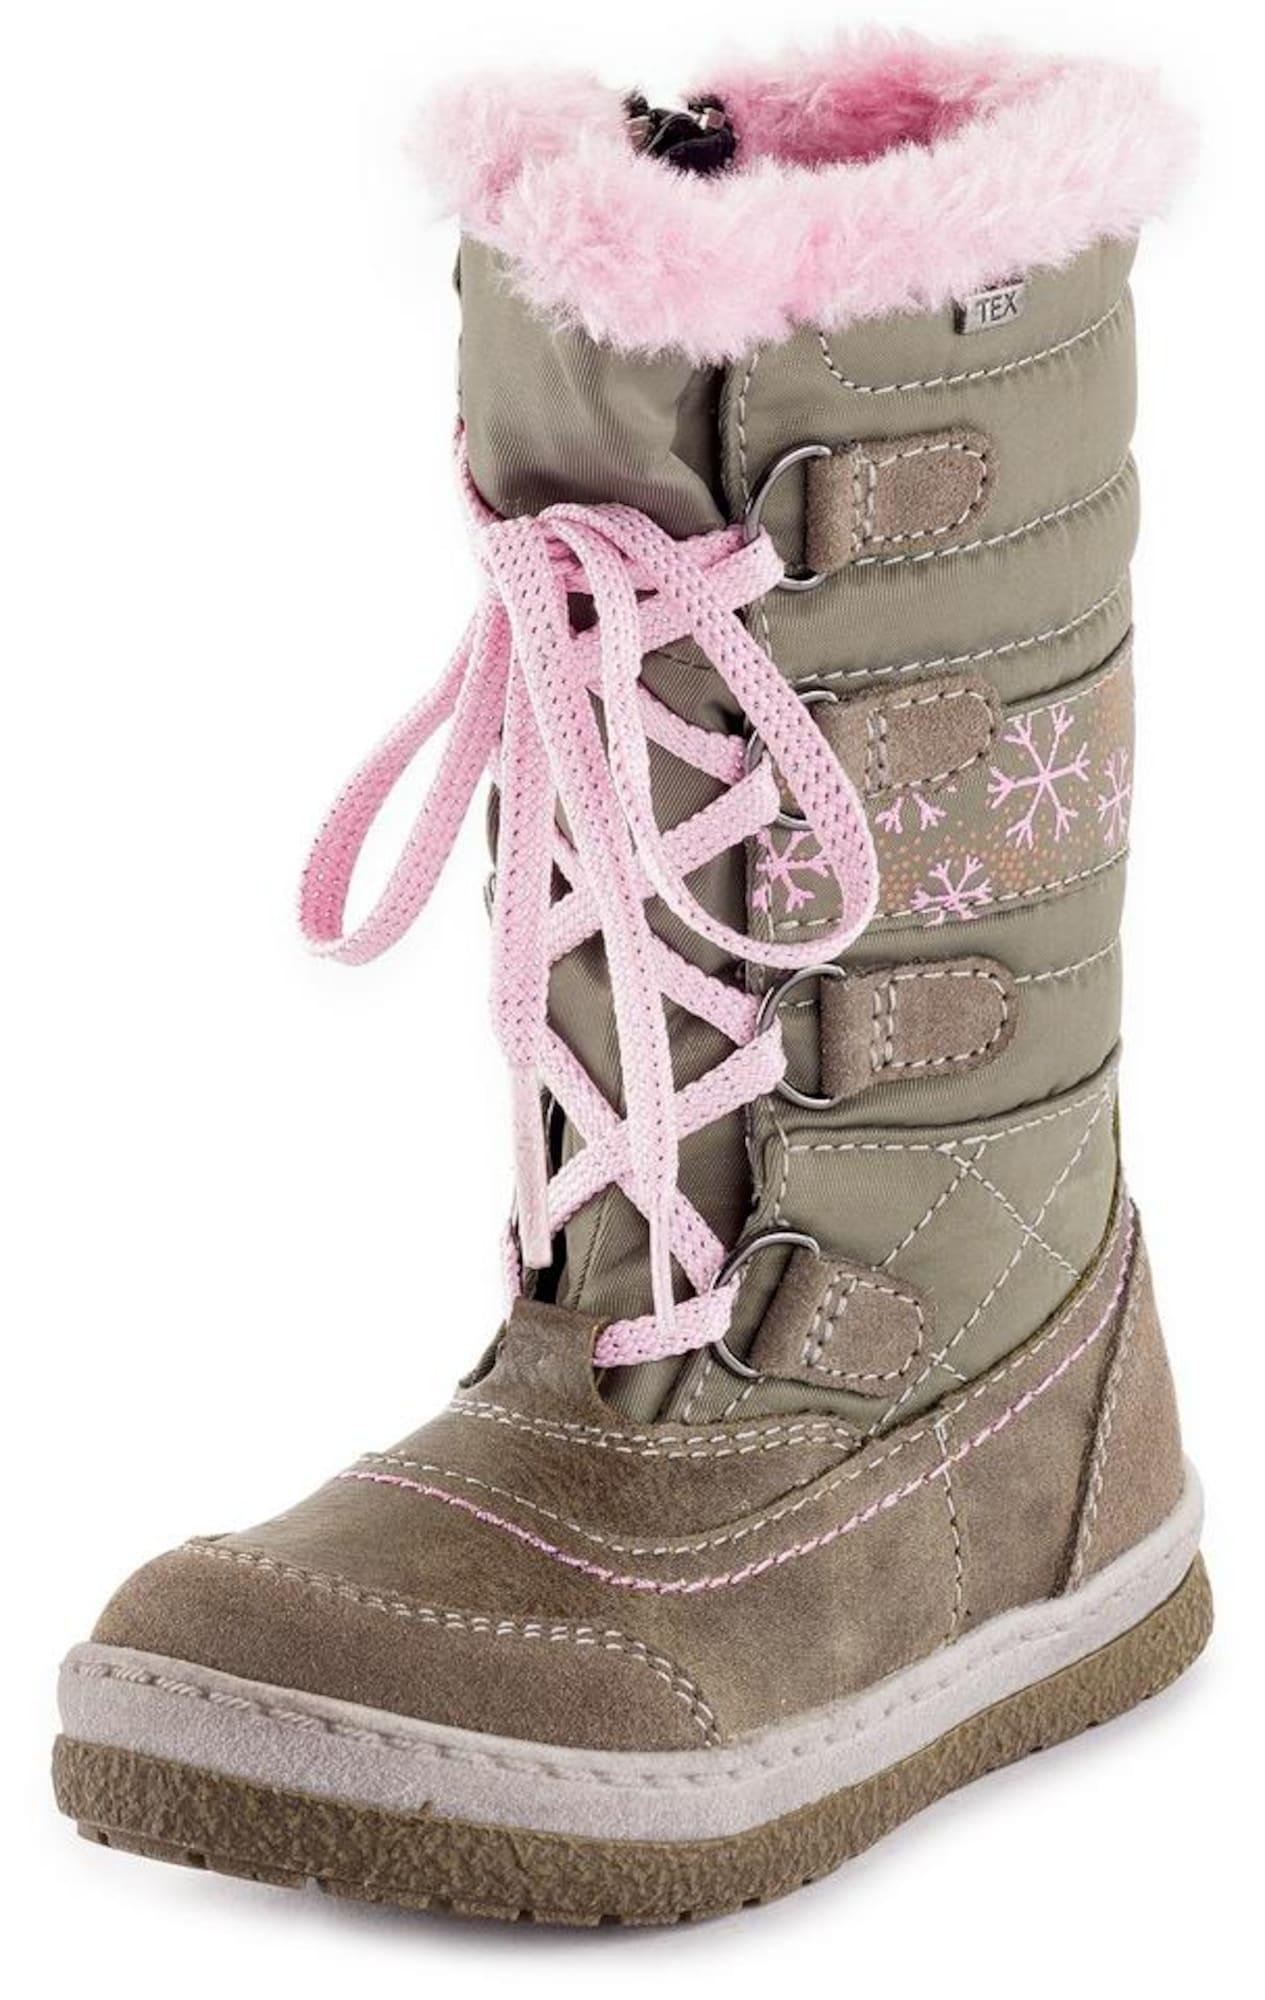 Winterstiefel 'Alpy-Tex' | Schuhe > Stiefel > Winterstiefel | Grau | LURCHI